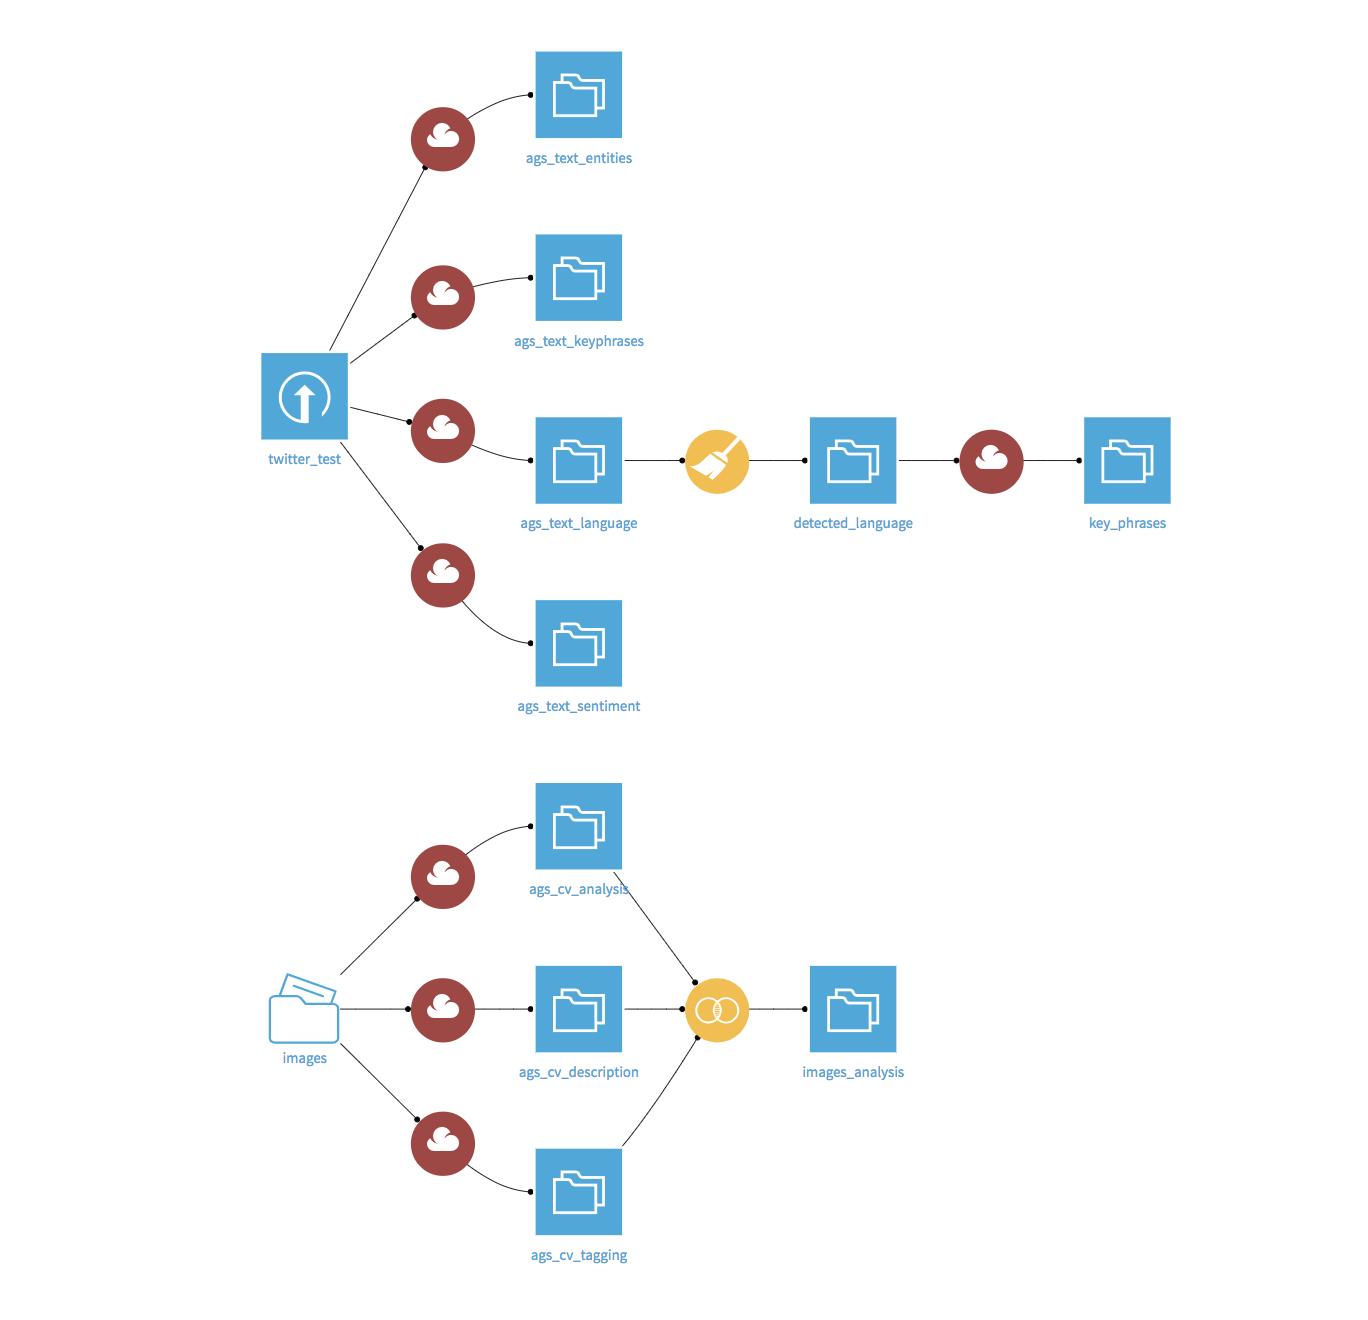 A Flow using the Cognitive Services API's